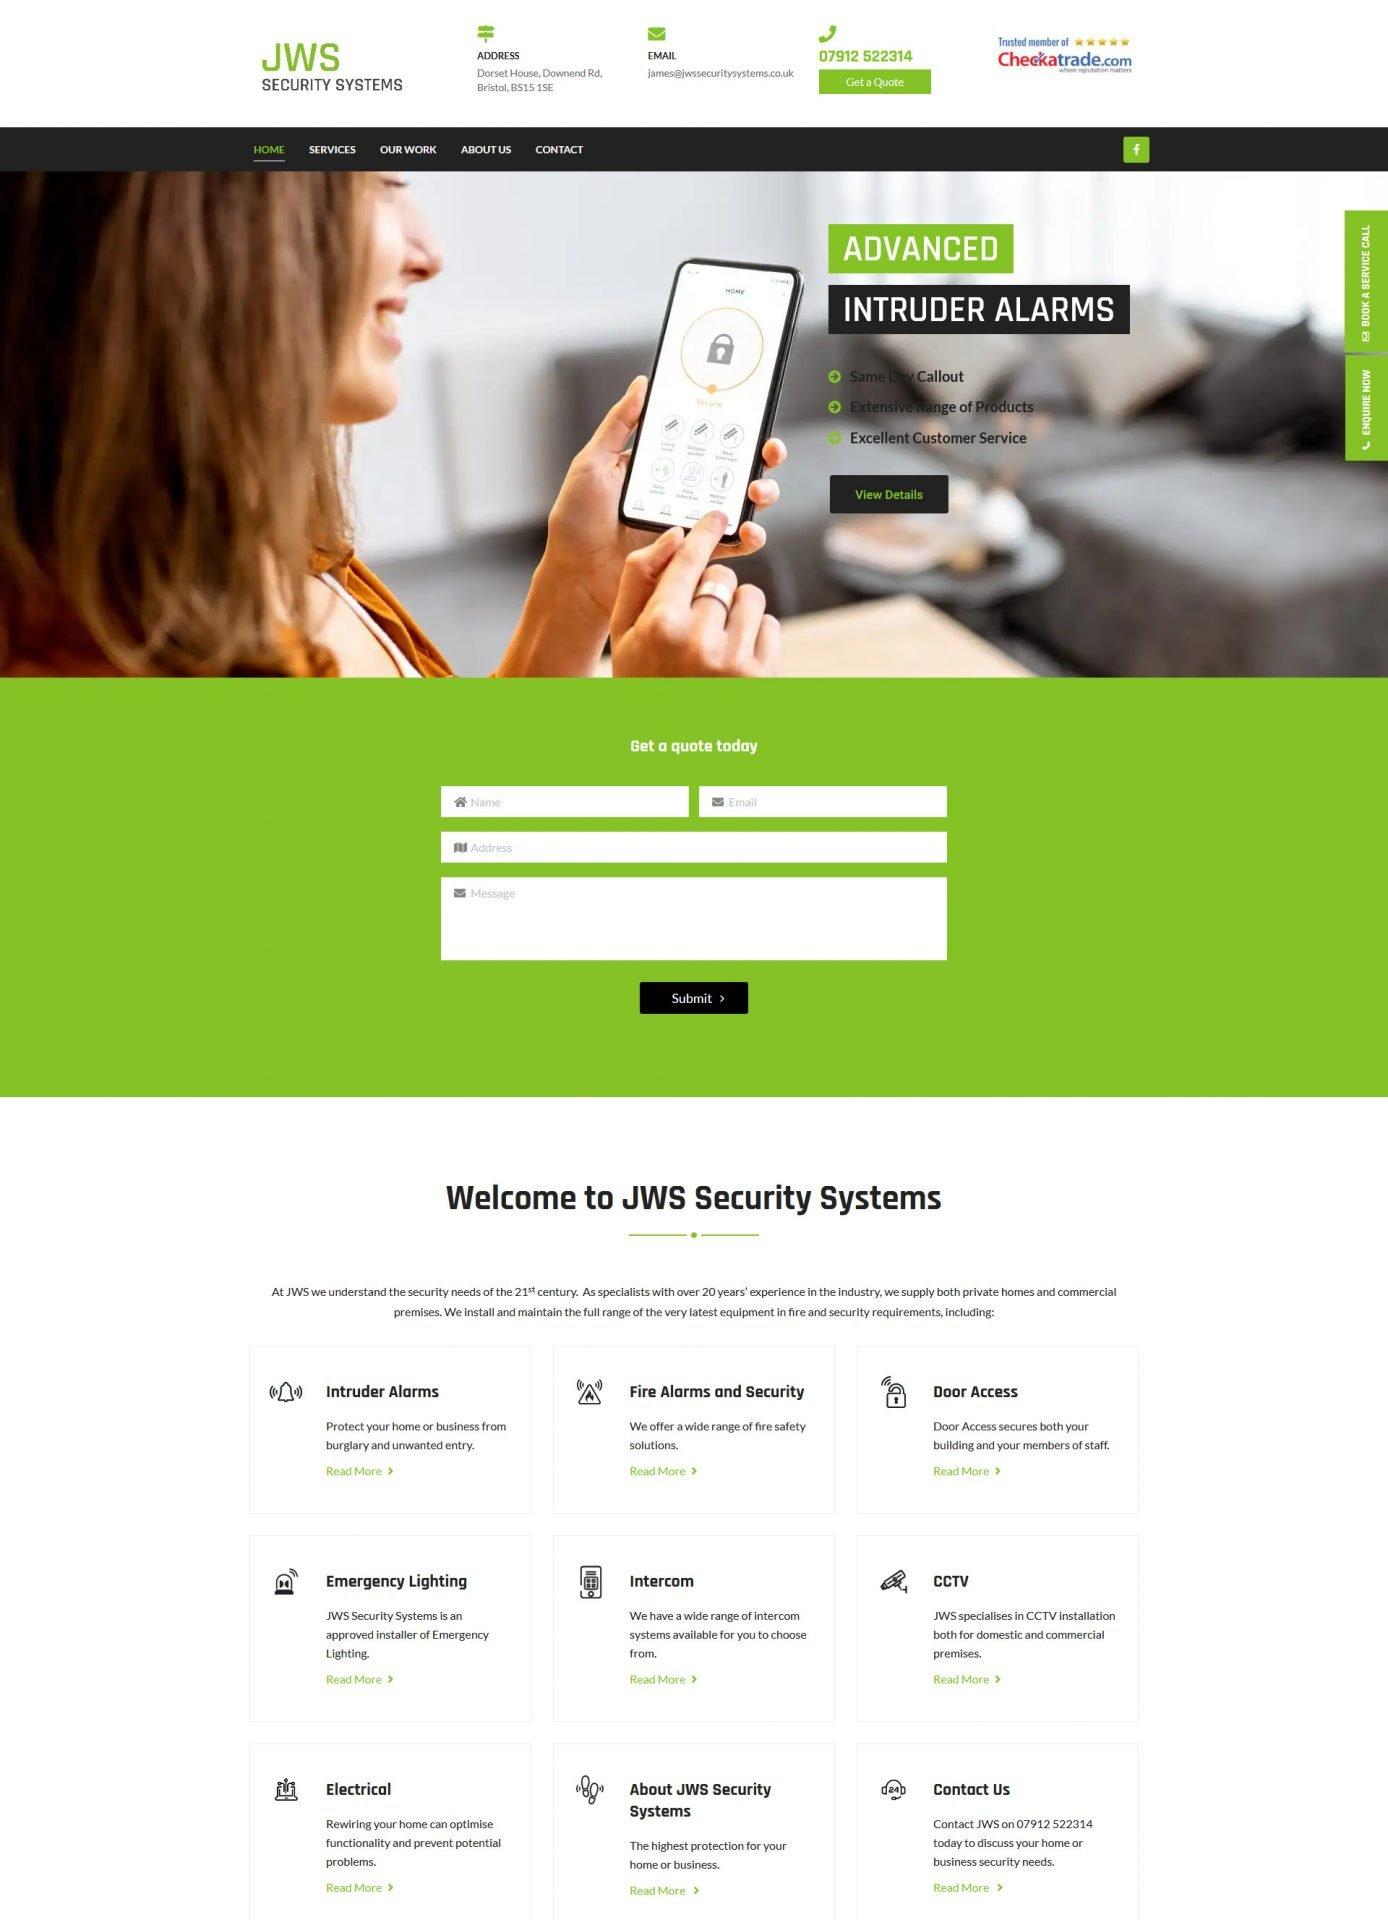 JWS Security Systems